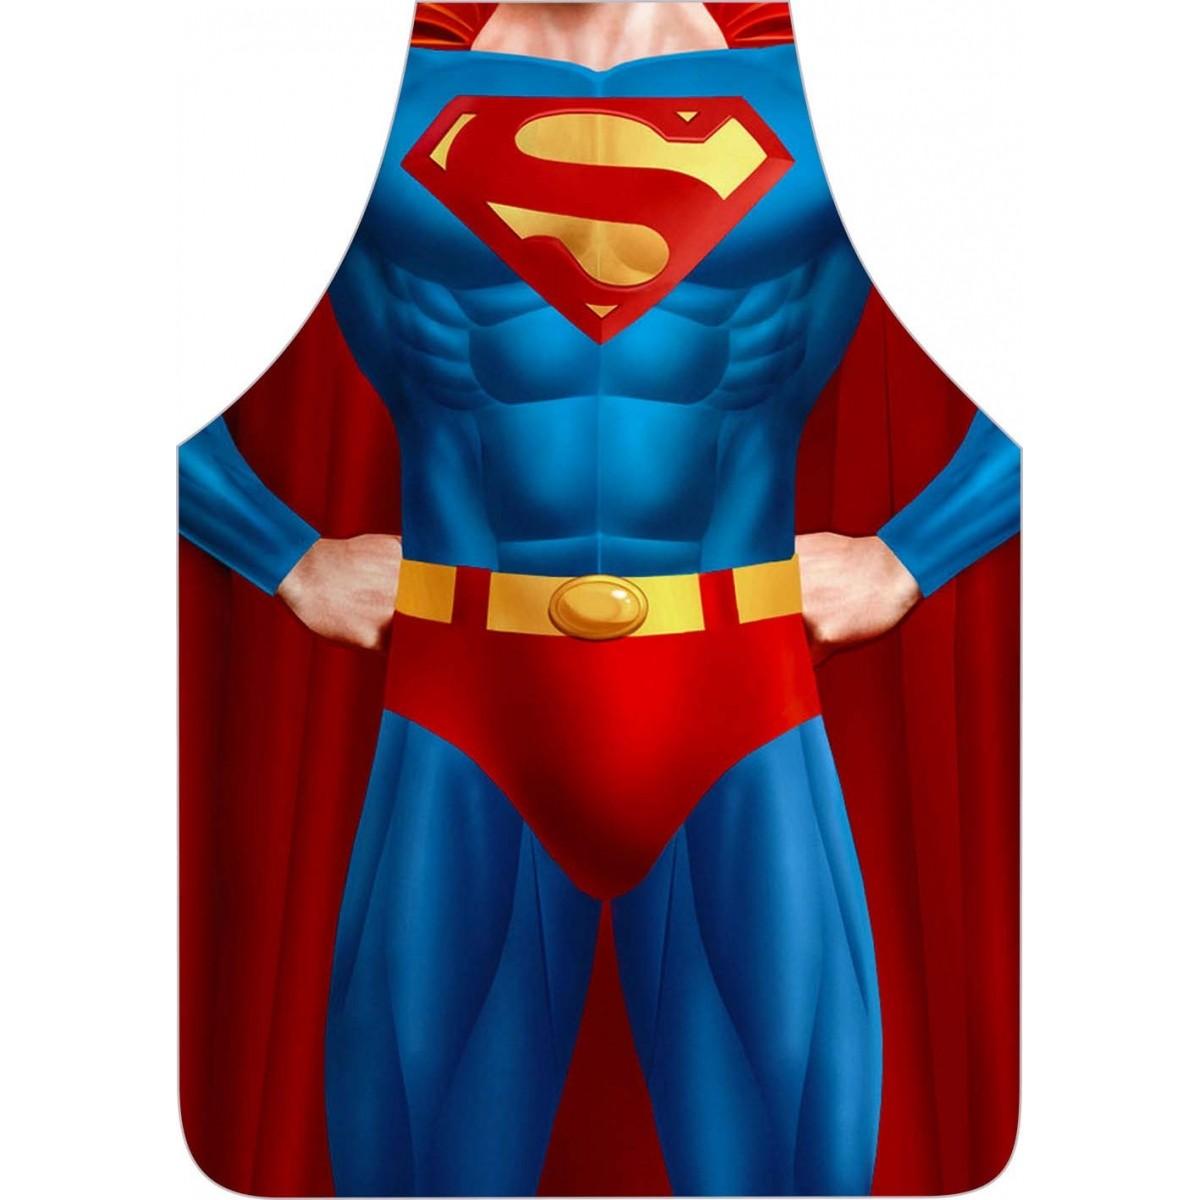 Avental Divertido E Personalizado: Superman  - RECANTO DA COSTURA